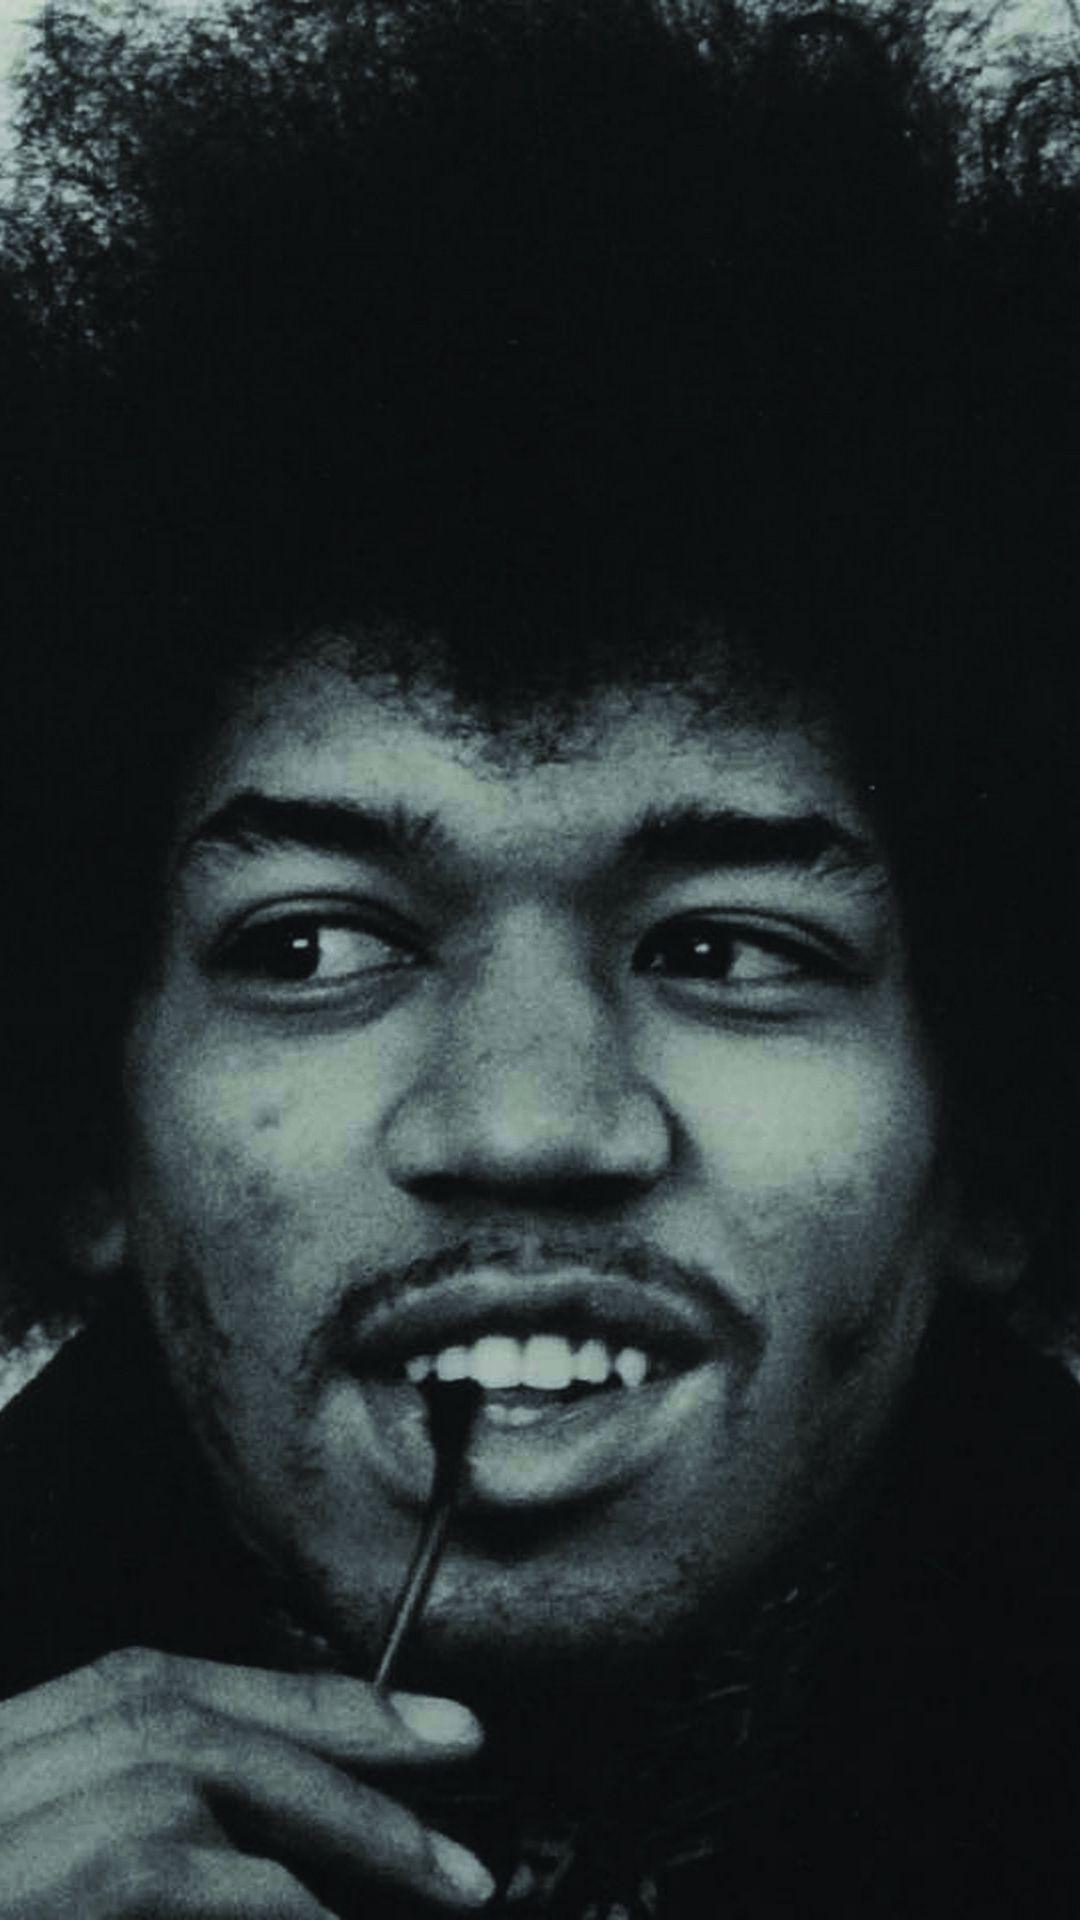 Singer Virtuoso Guitarist Jimi Hendrix Music Wallpaper